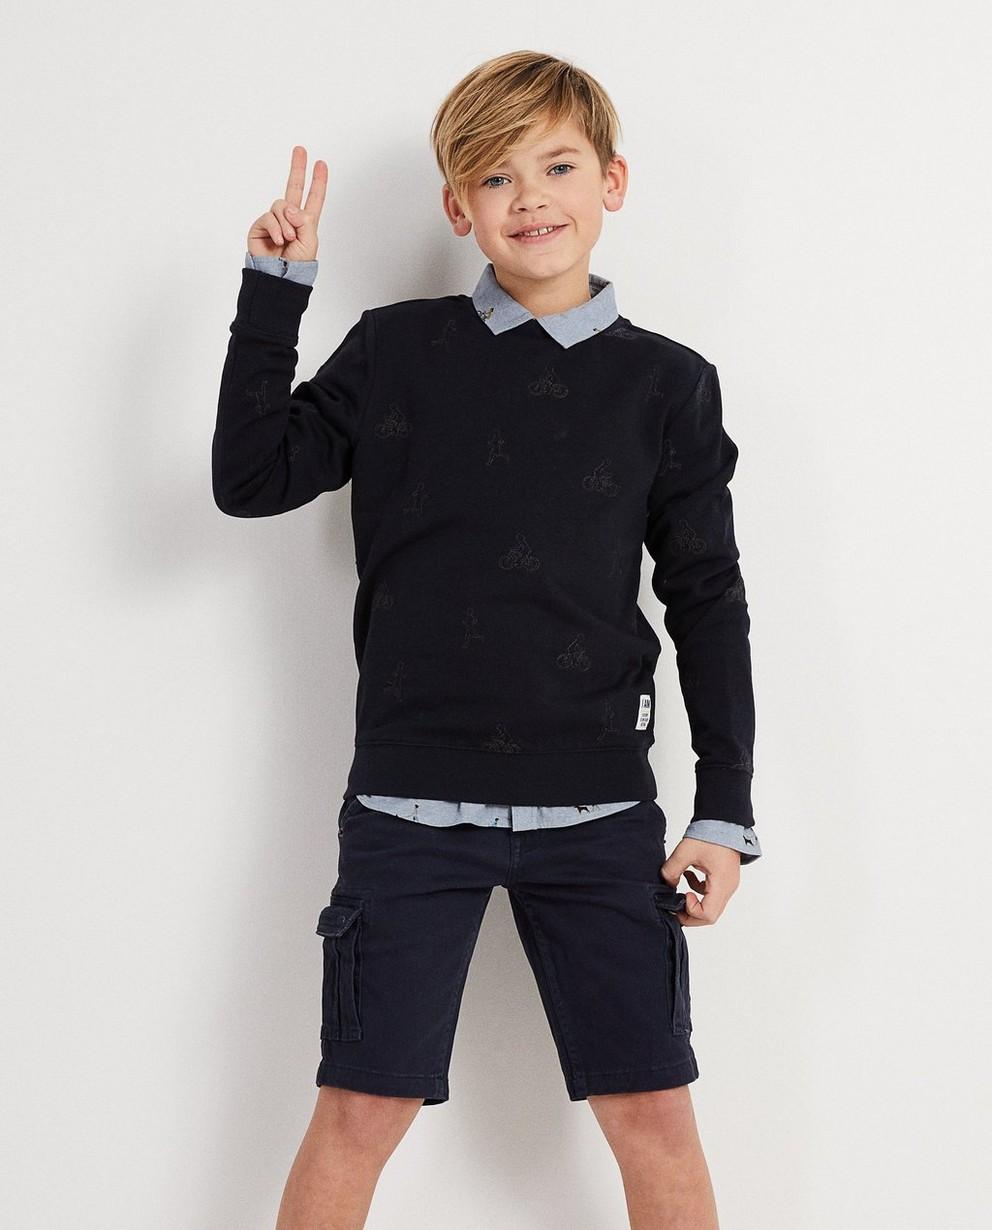 Sweater - Navy - Sweater mit gesticktem Print